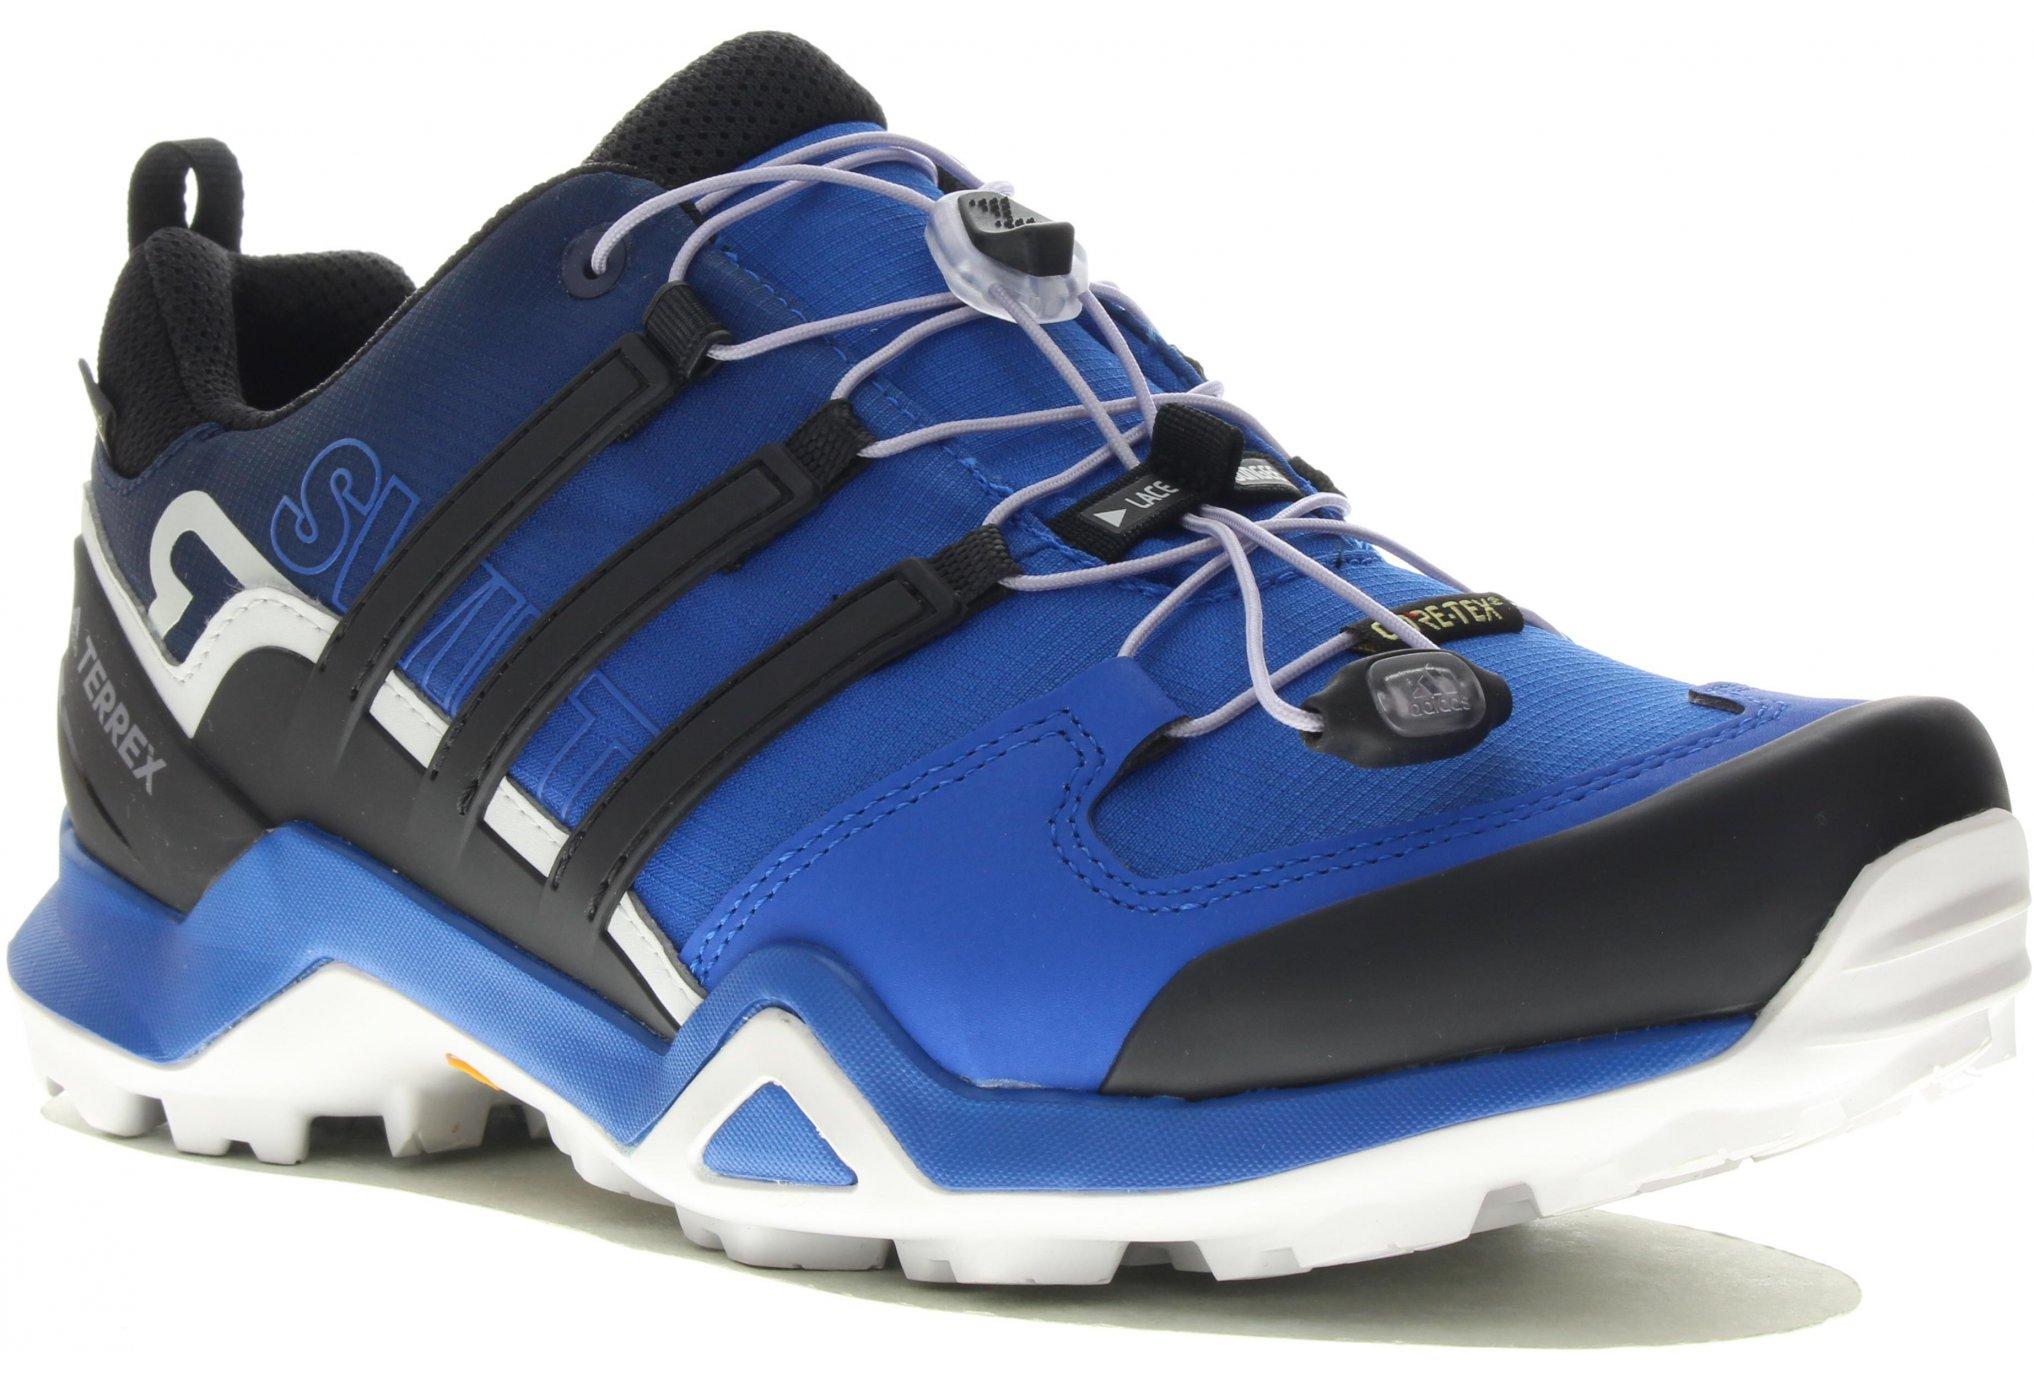 Homme Terrex Trail M Chaussures Adidas Gore Swift Tex Session R2 qSpMGUzV